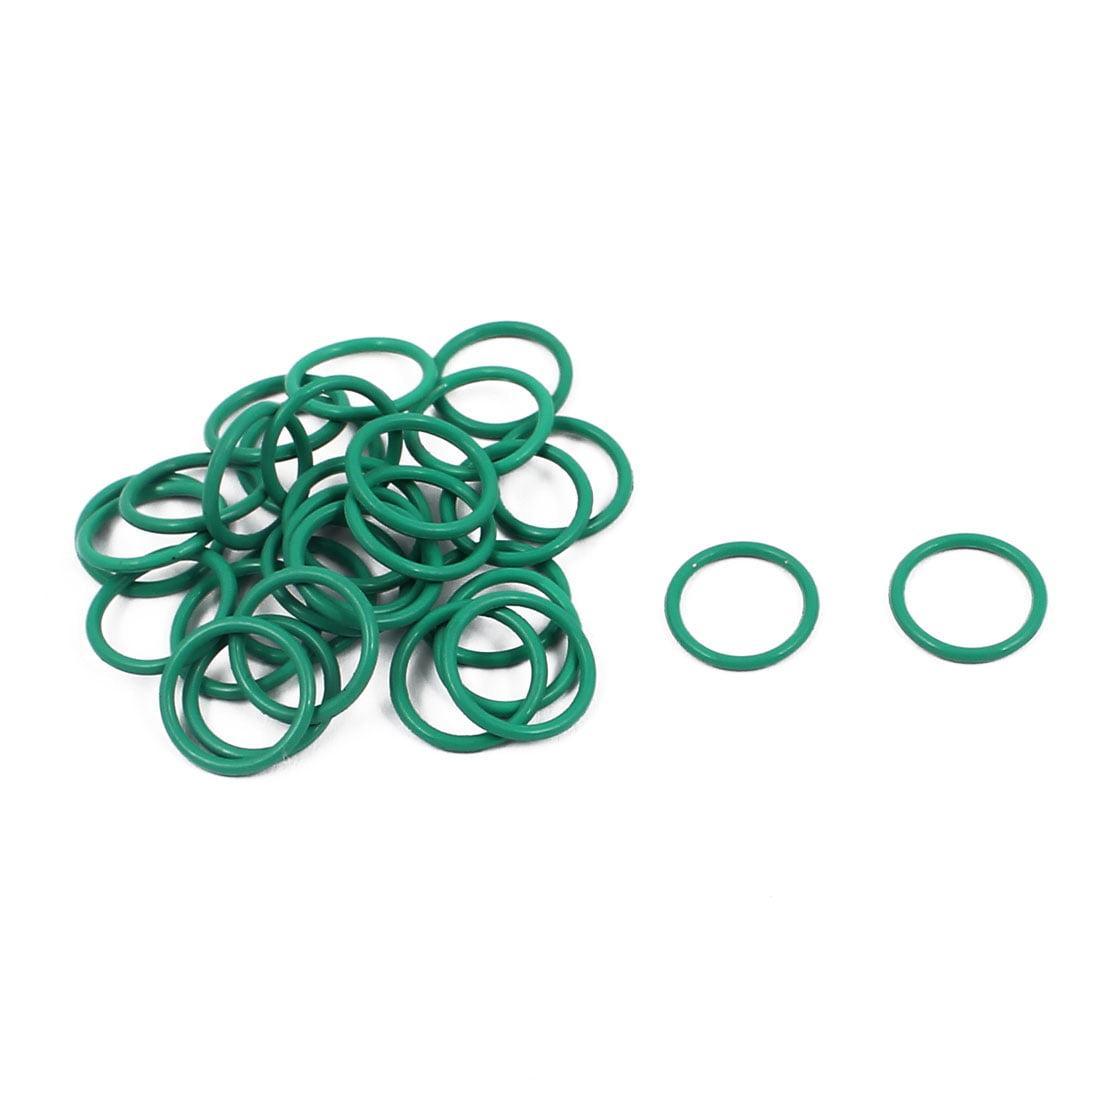 30Pcs 10mm x 1mm FKM Fluoro Rubber O-rings Heat Resistant Sealing Ring Grommets